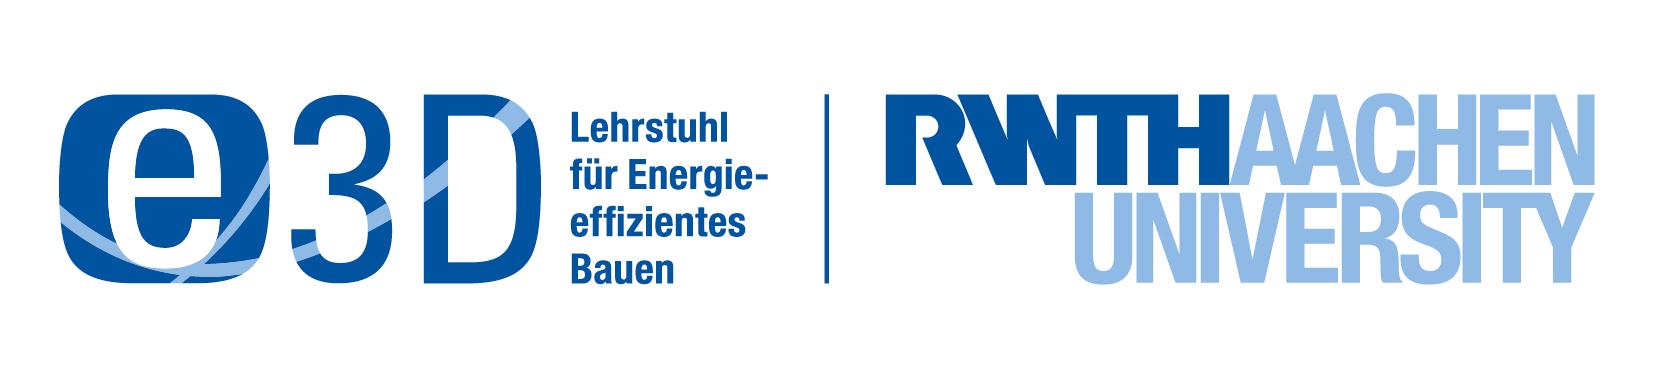 doc/logos/rwth_e3d.jpg